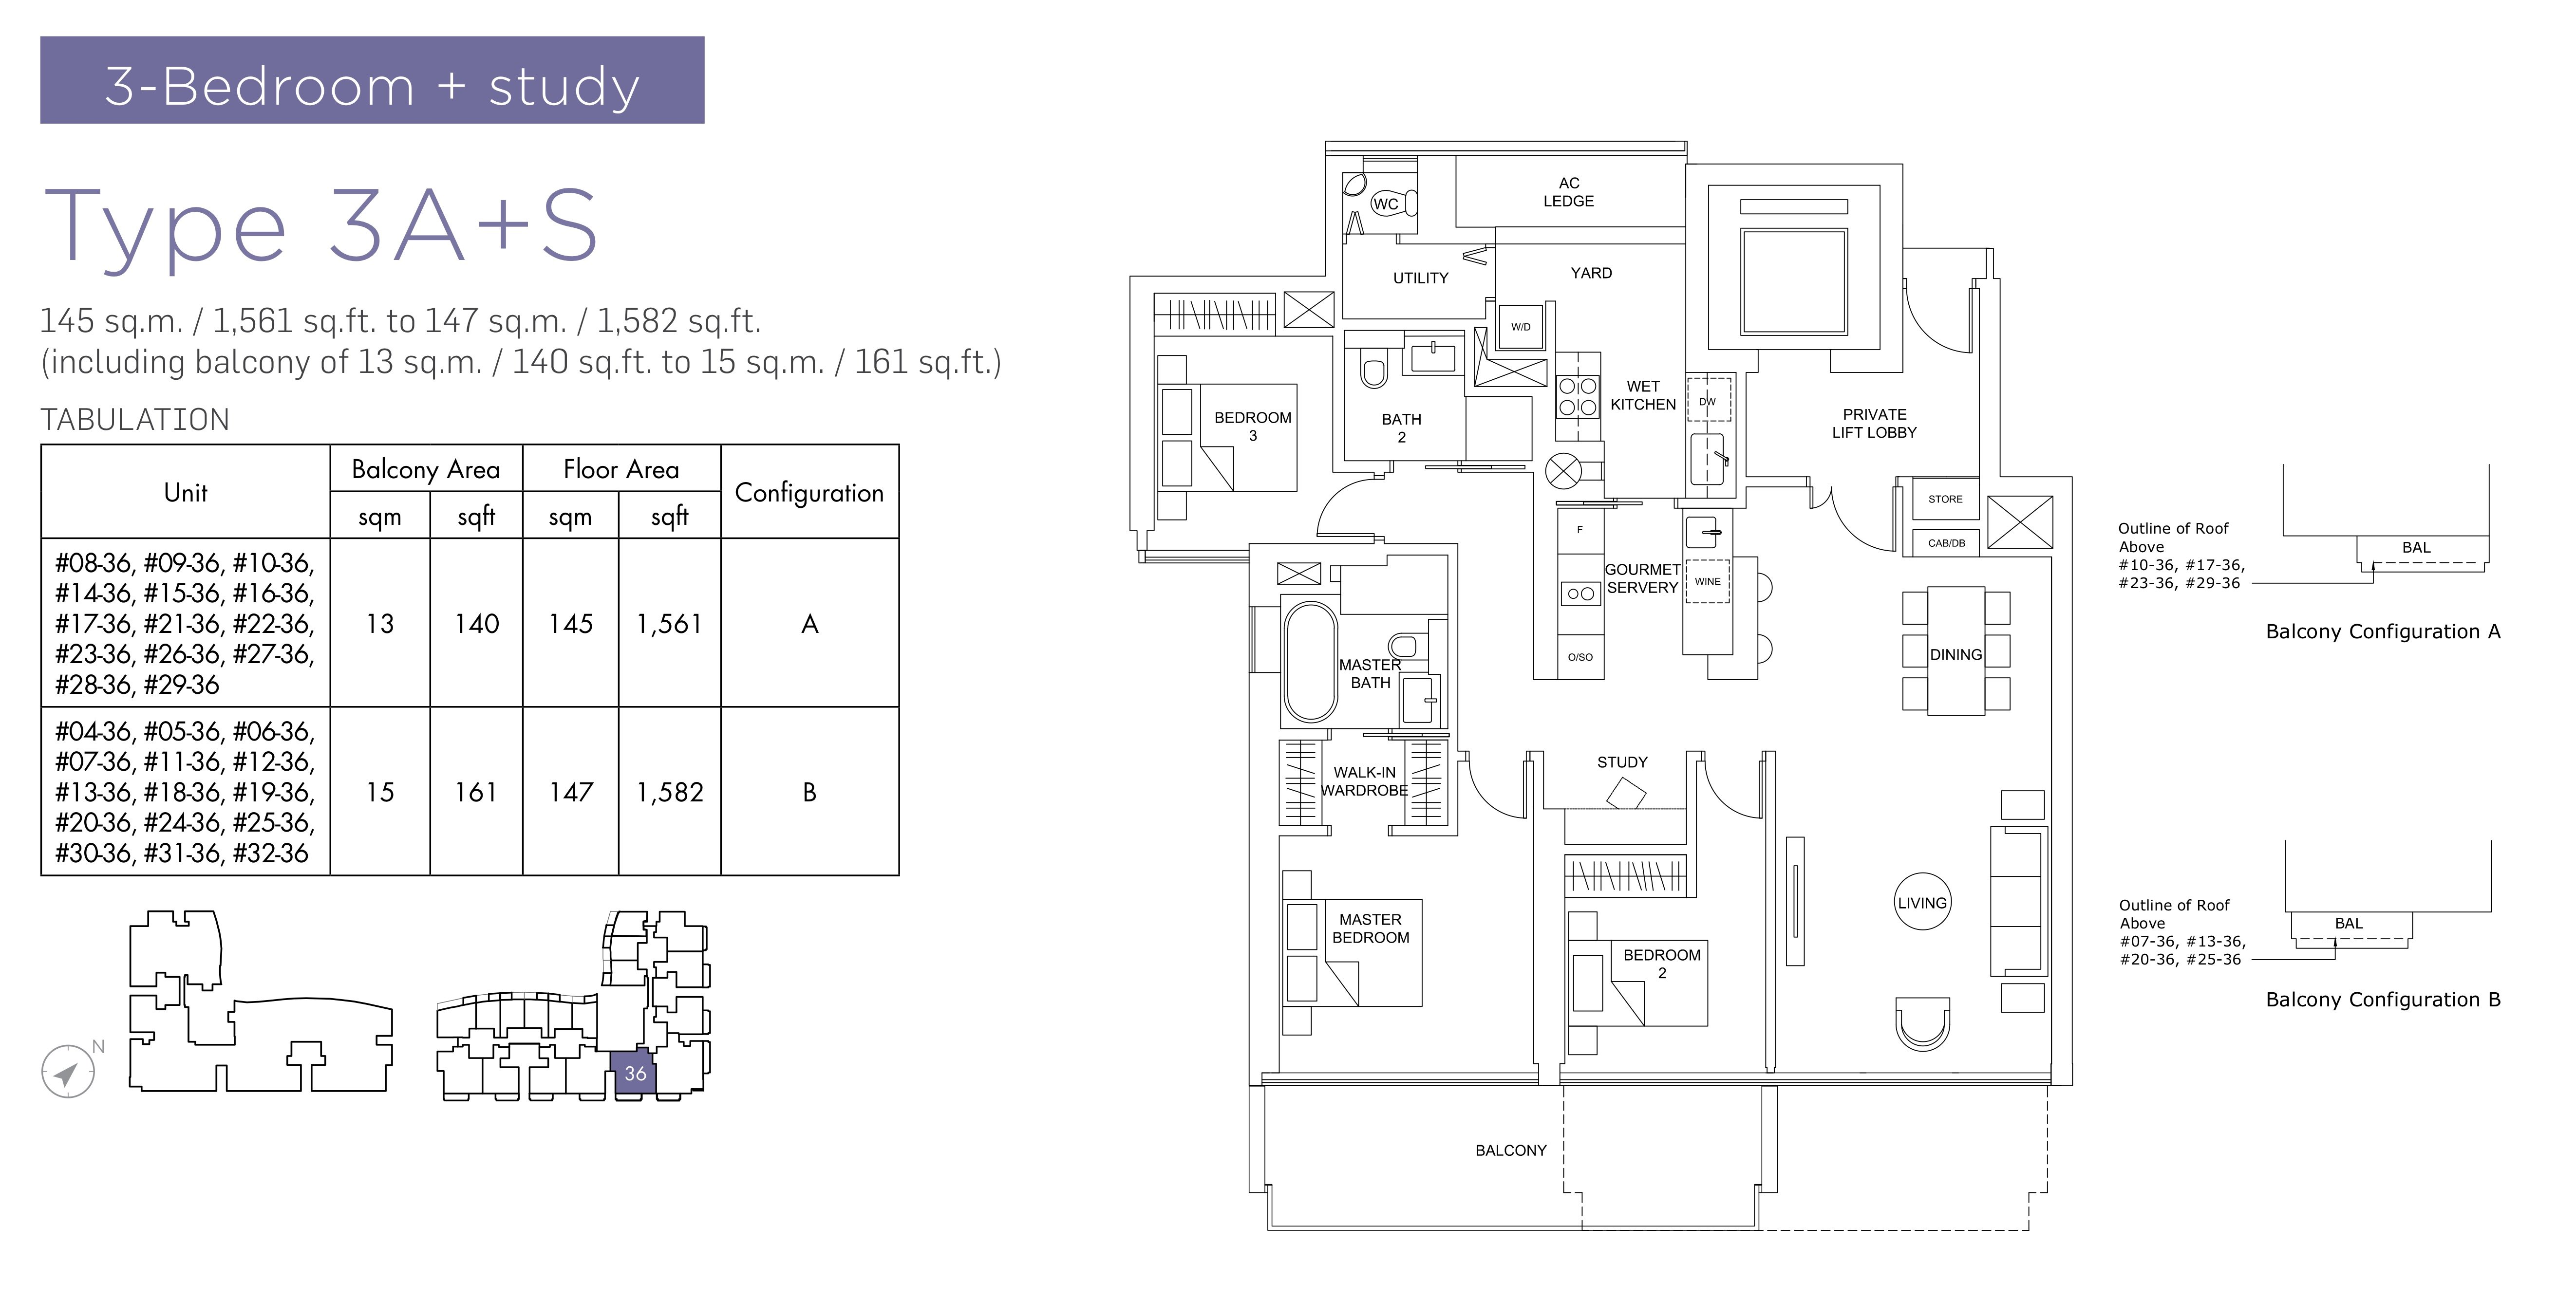 Marina One Residences 滨海盛景豪苑 floor plans 3 bedroom +study 3A+S